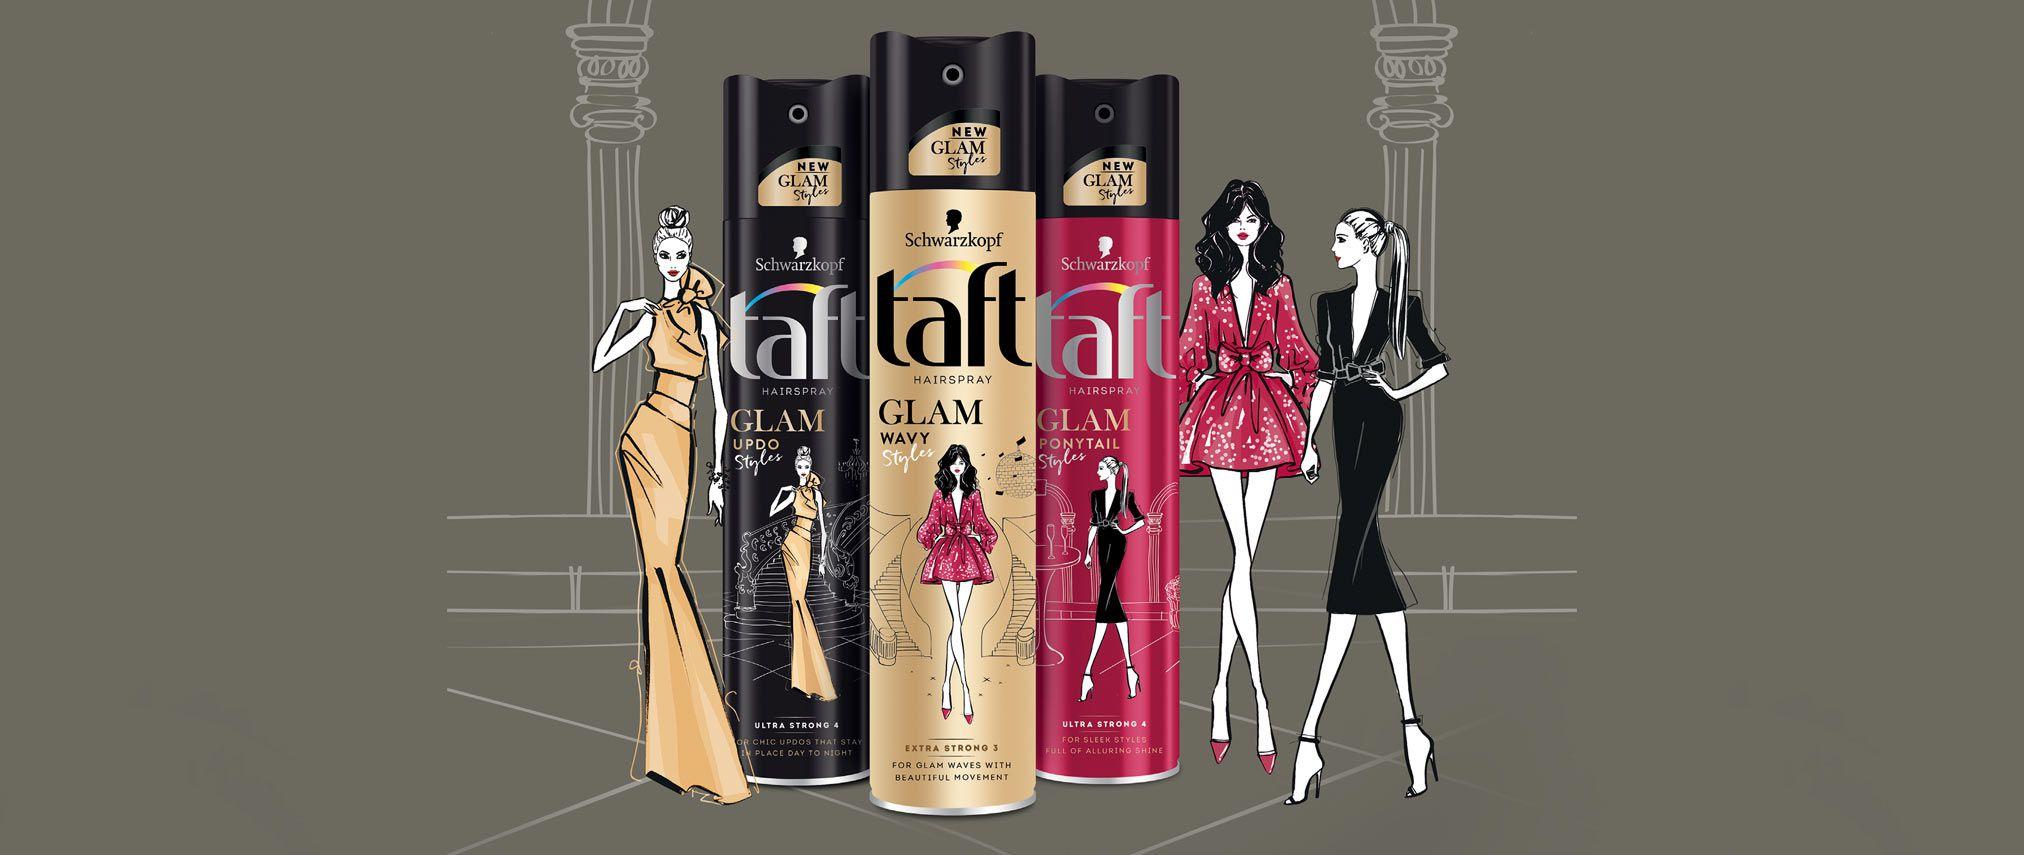 Taft Glamstyle naramky podklad